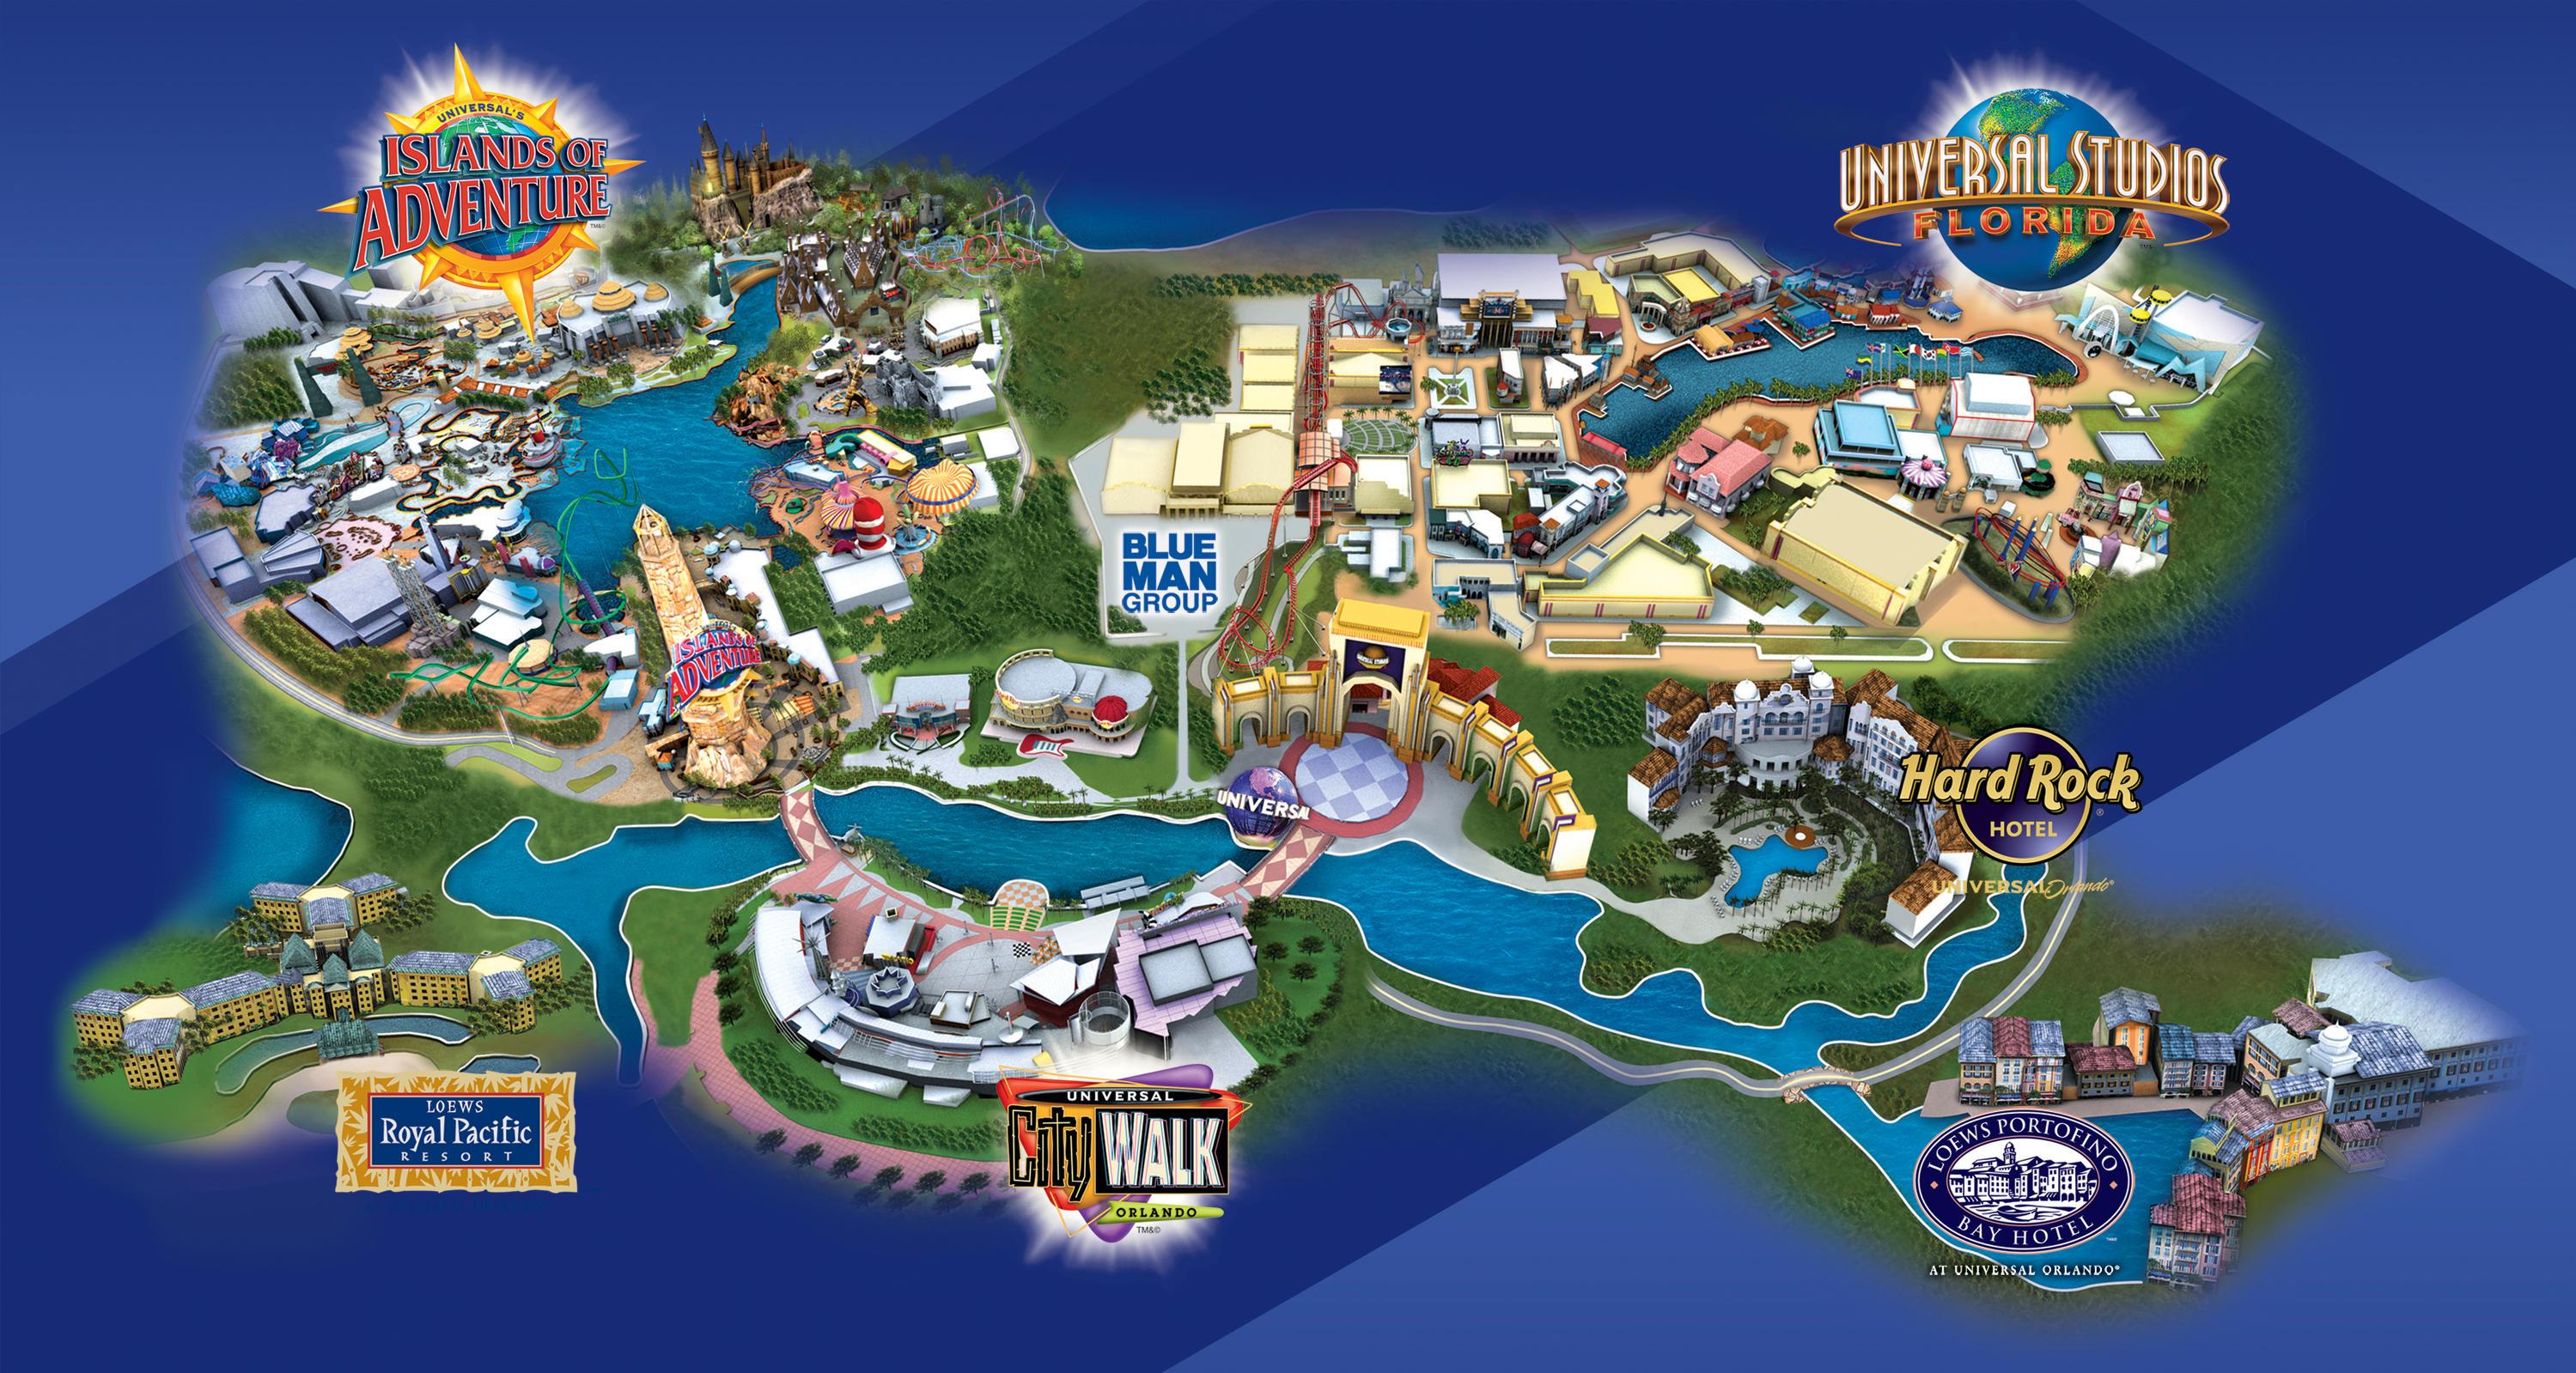 universal orlando resort map by viator universal orlando tickets in orlandoflorida .  universal orlando resort map  atracciones de universal studios